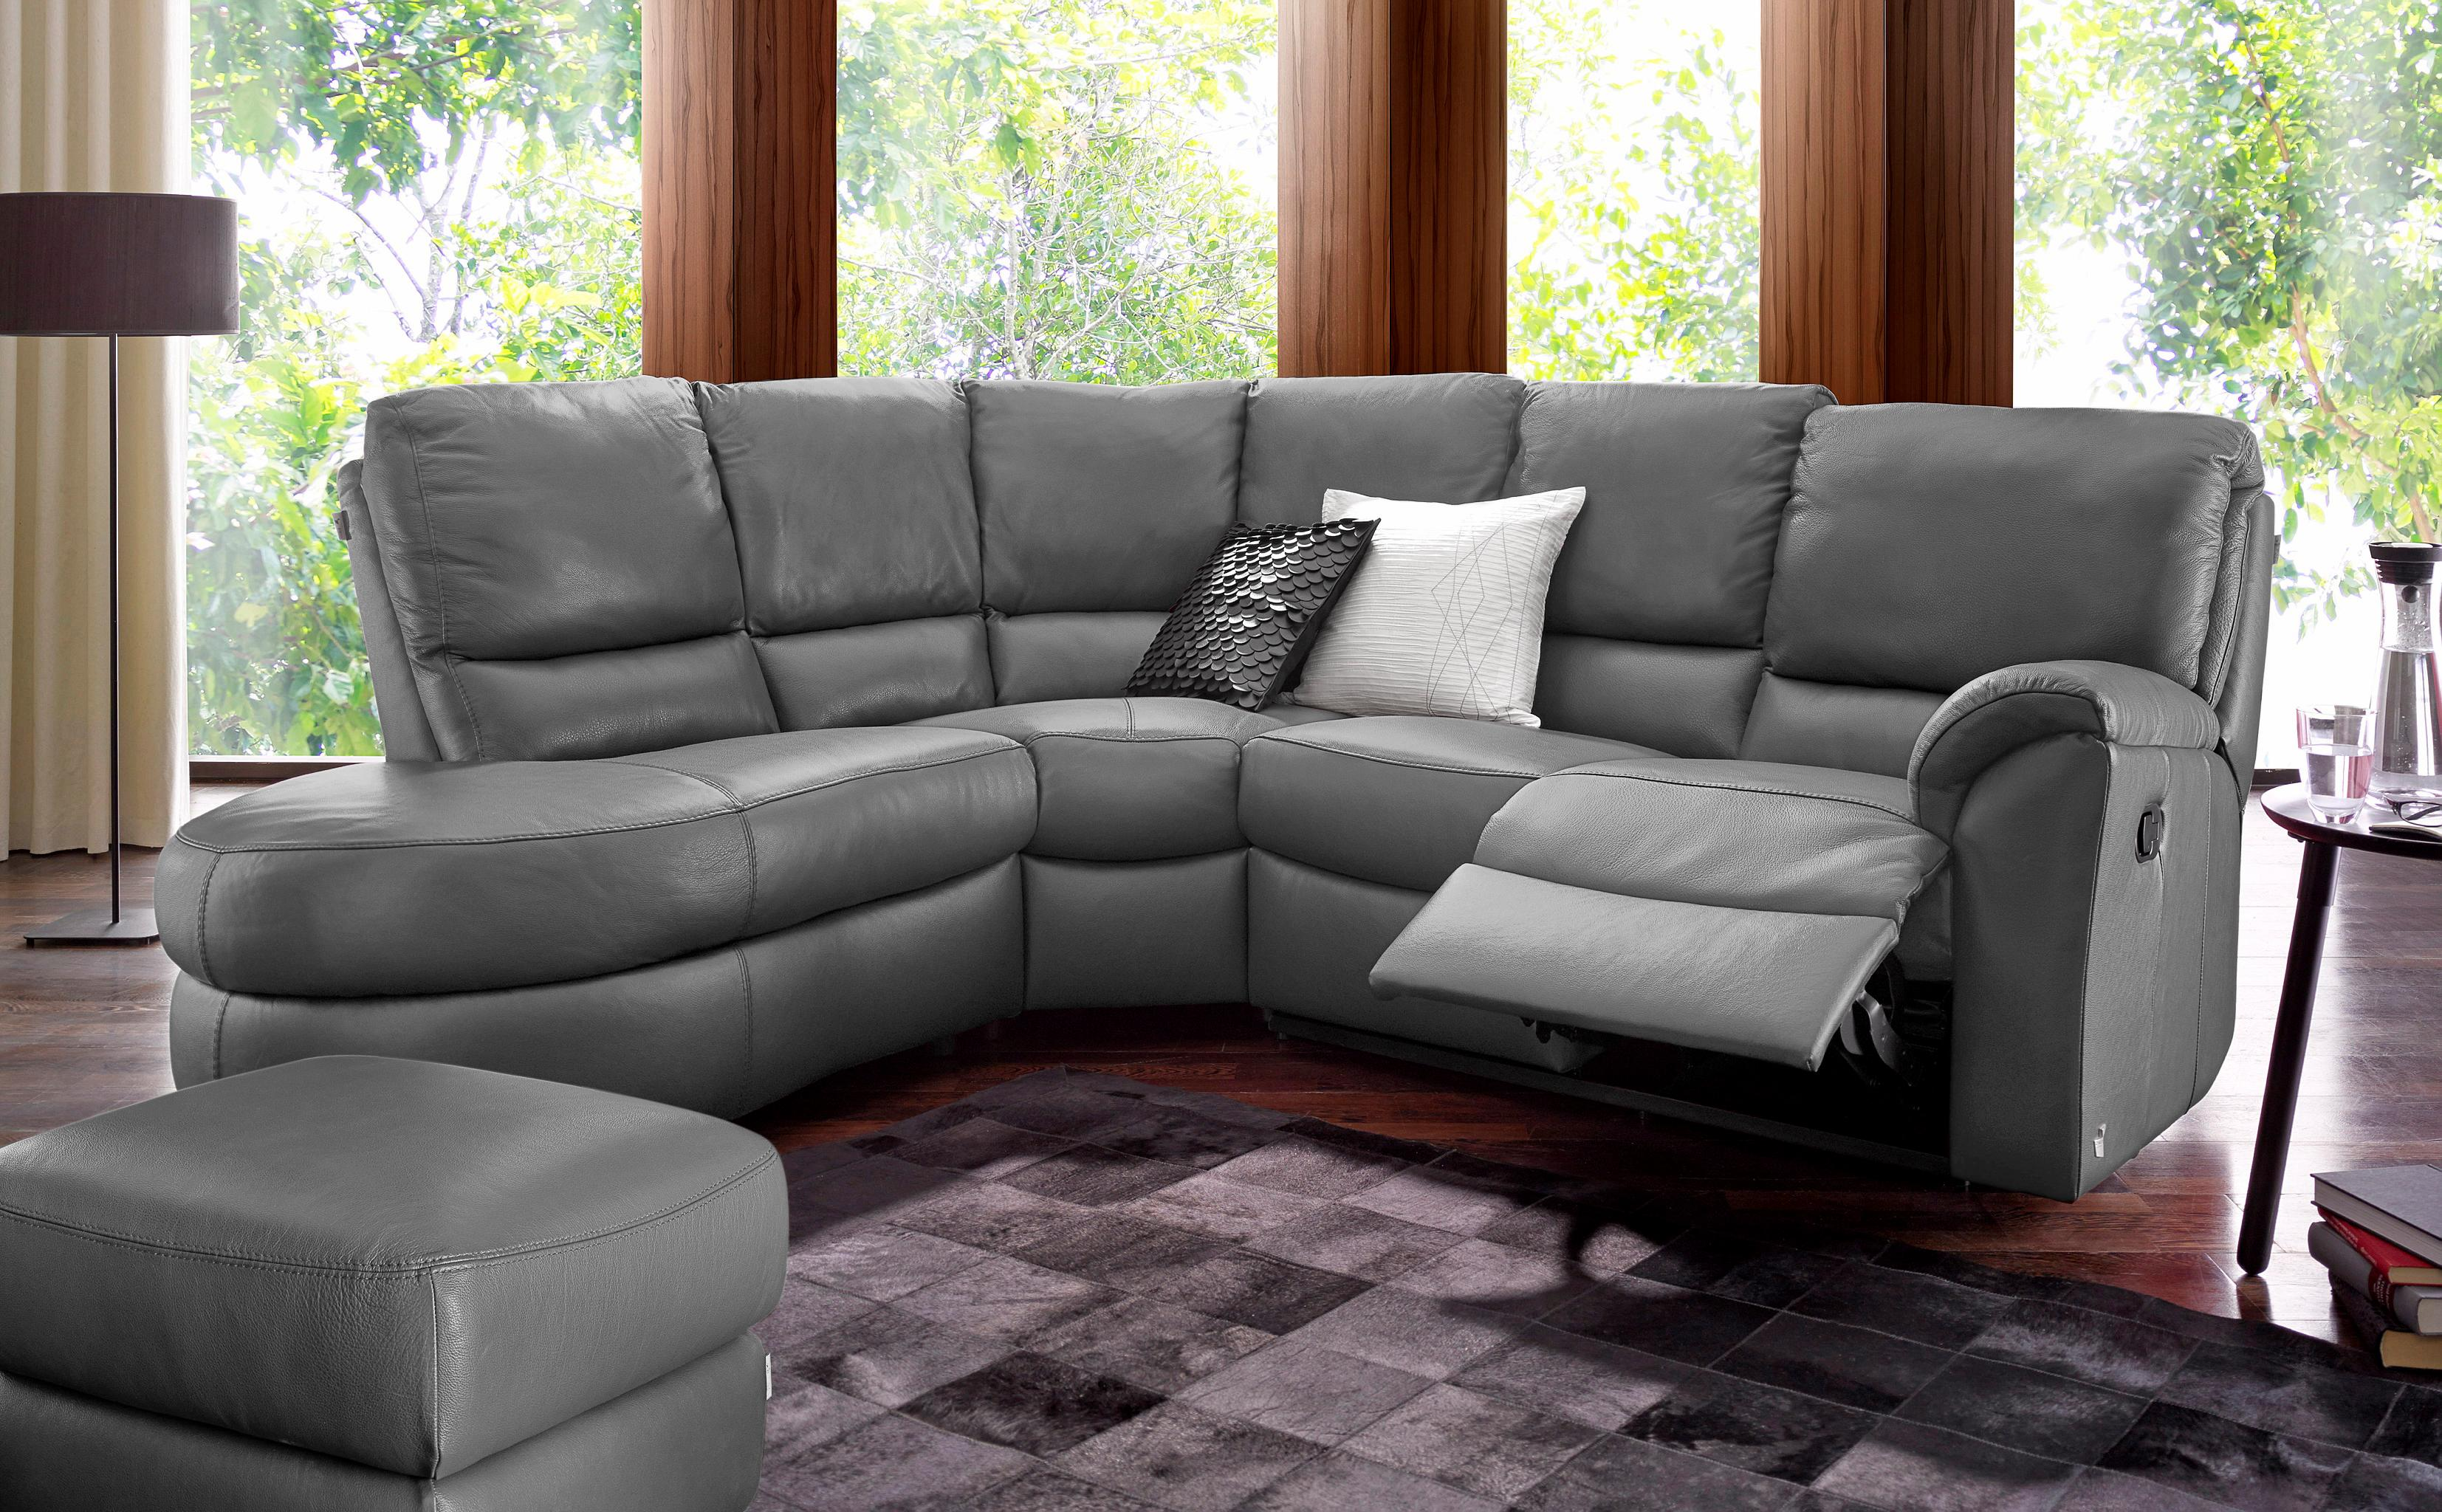 calia italia ecksofa cs mark auf rechnung bestellen. Black Bedroom Furniture Sets. Home Design Ideas